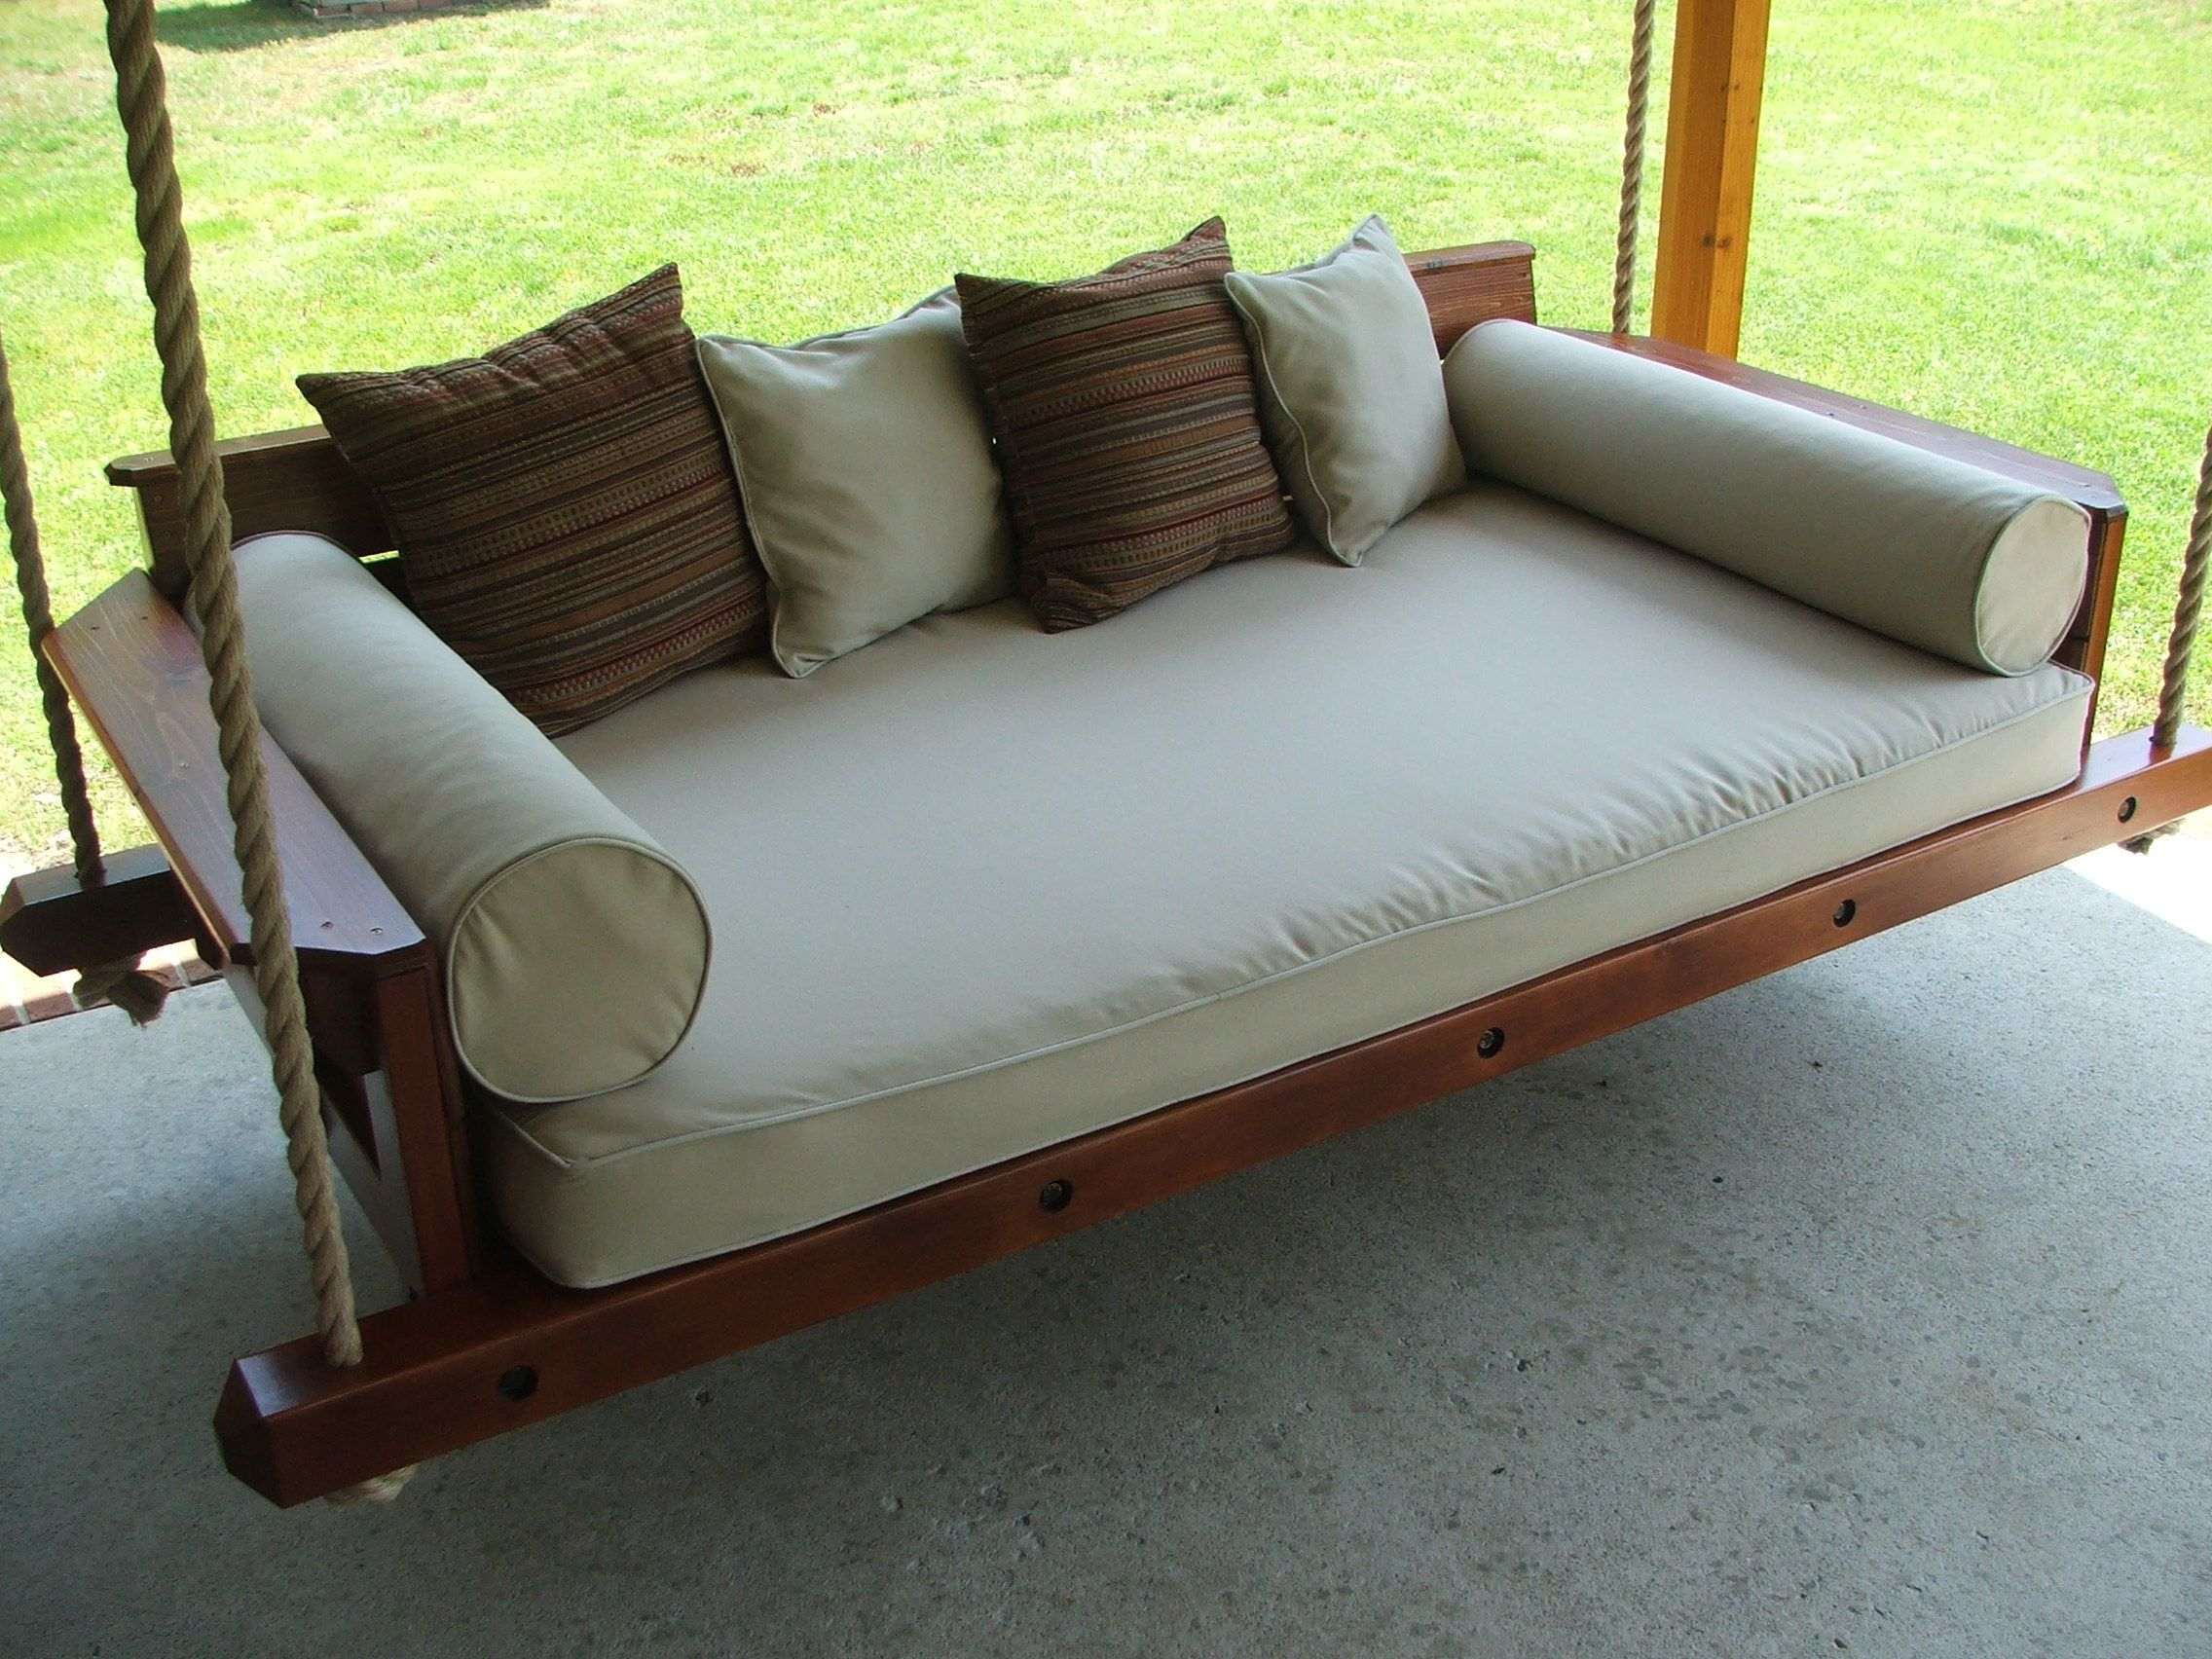 Custom Rustic Porch Bed Swing by Carolina Porch Swings